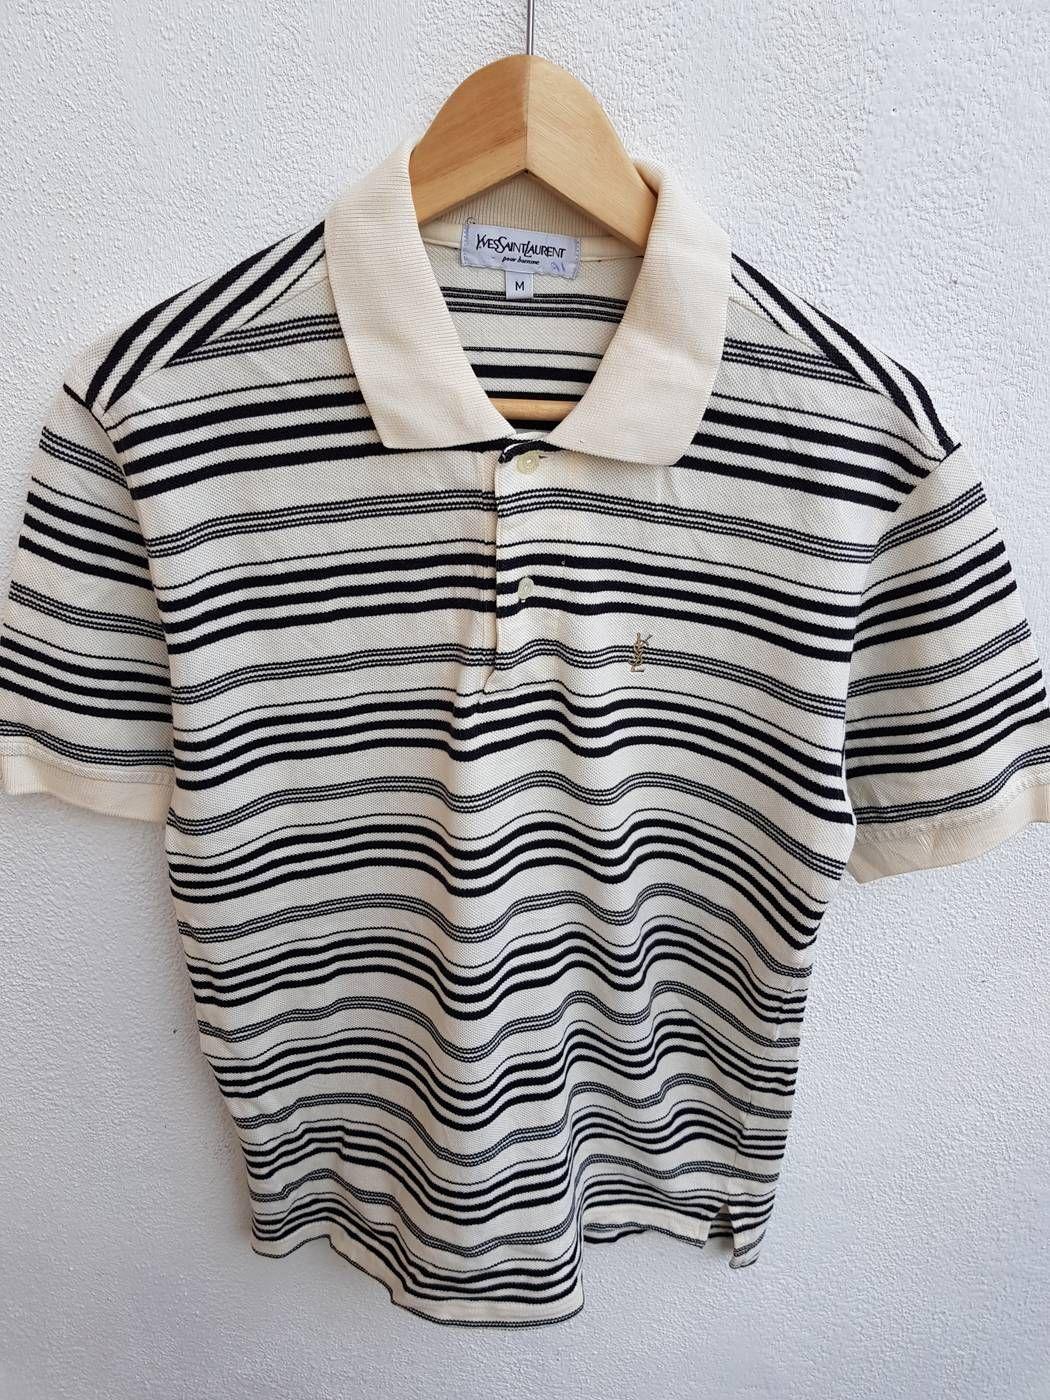 a5170eac6334 Ysl Pour Homme Vintage 90s YSL Yves Saint Laurent Pour Homme Stripes  Embroidered Monogram Polos Shirt